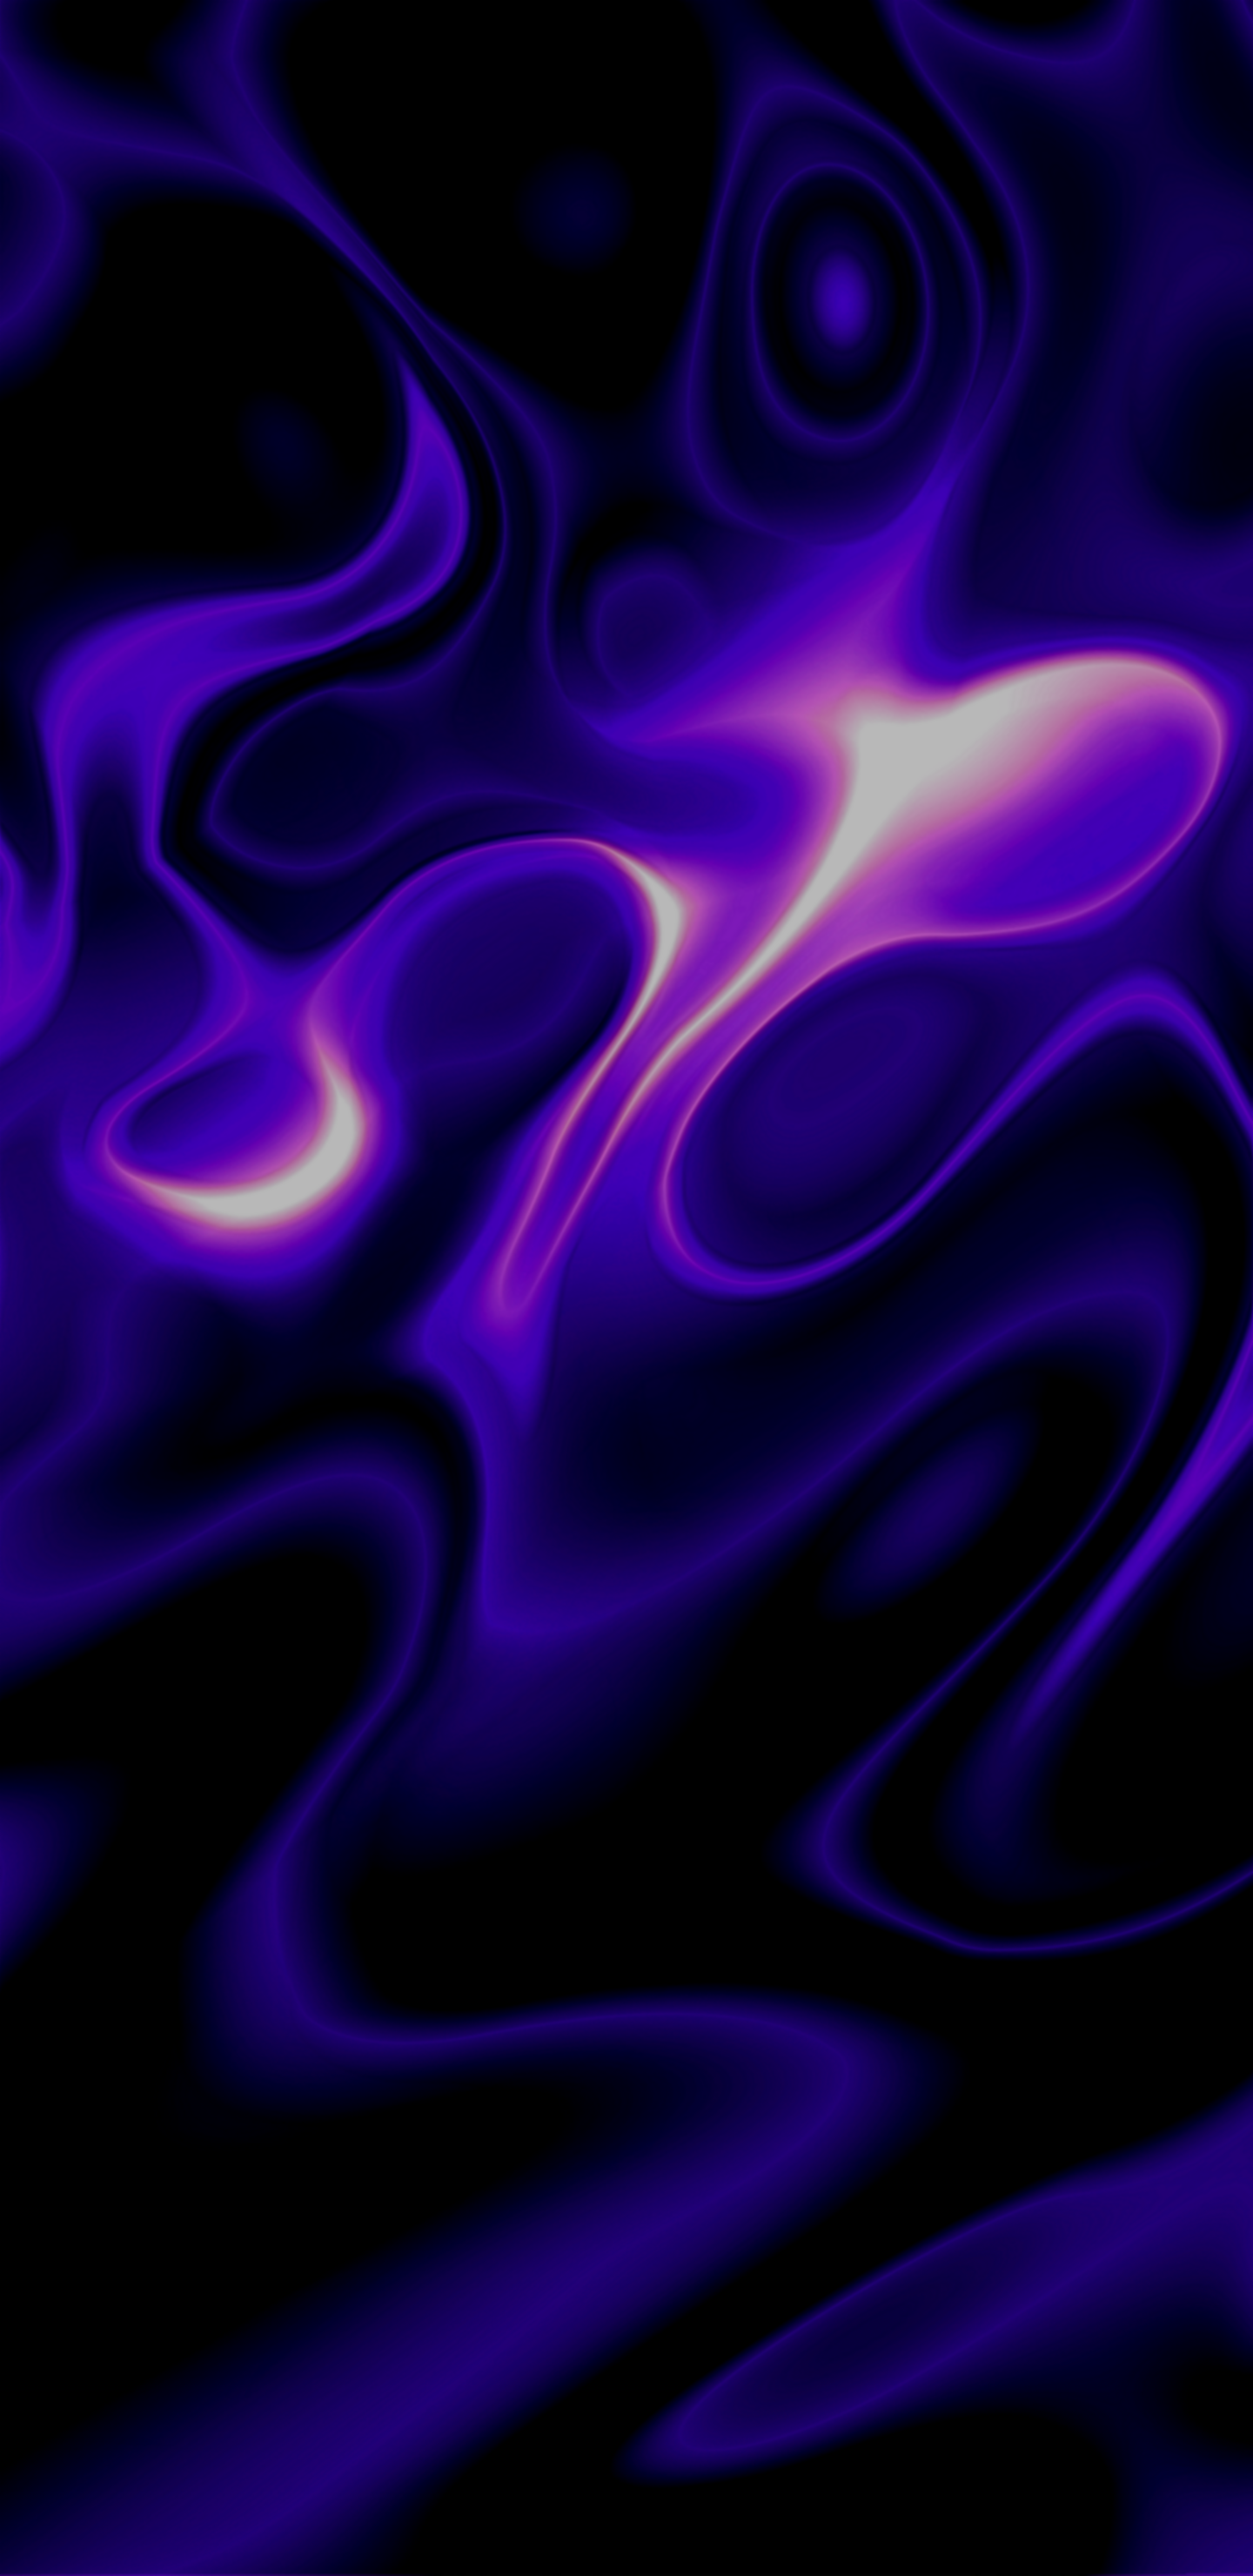 Blacklightliquid Oc 1440x2960 Purple Wallpaper Stunning Wallpapers Cellphone Wallpaper